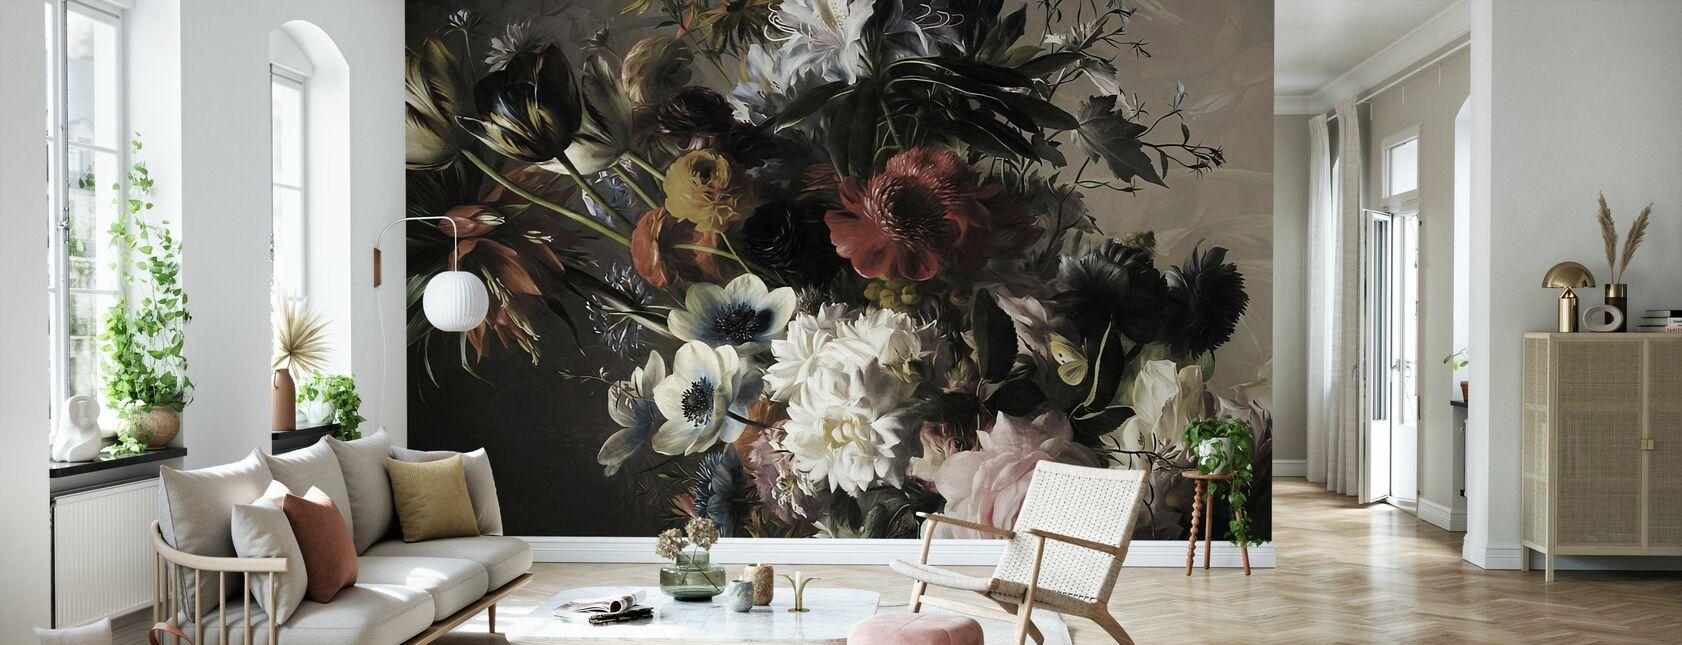 Bouquet with Anemones - Wallpaper - Living Room